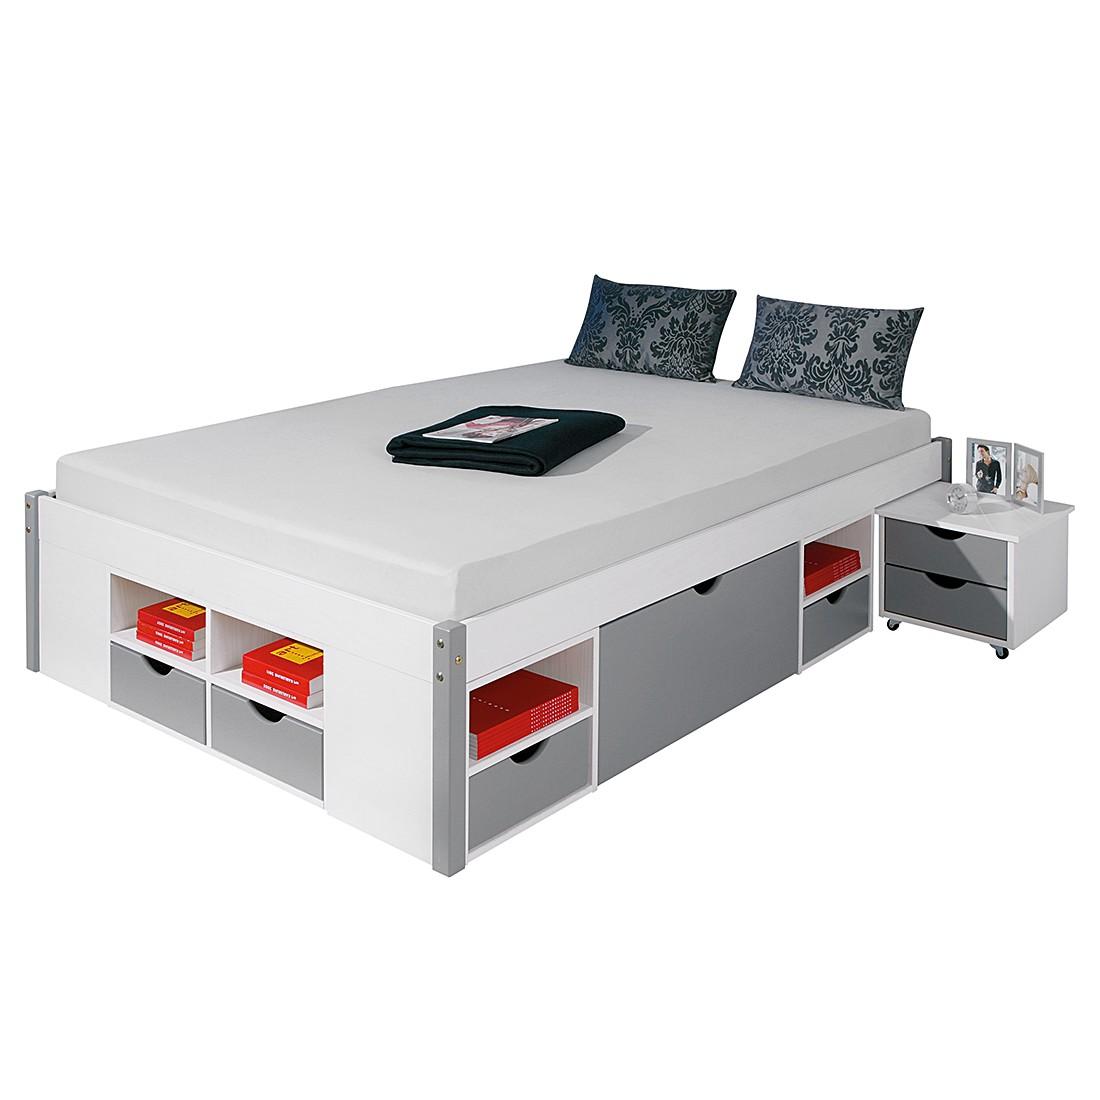 Funktionsbett Maren (inklusive Nachtkommoden) - Kiefer massiv - Weiß lackiert - 140 x 200cm, Lars Larson